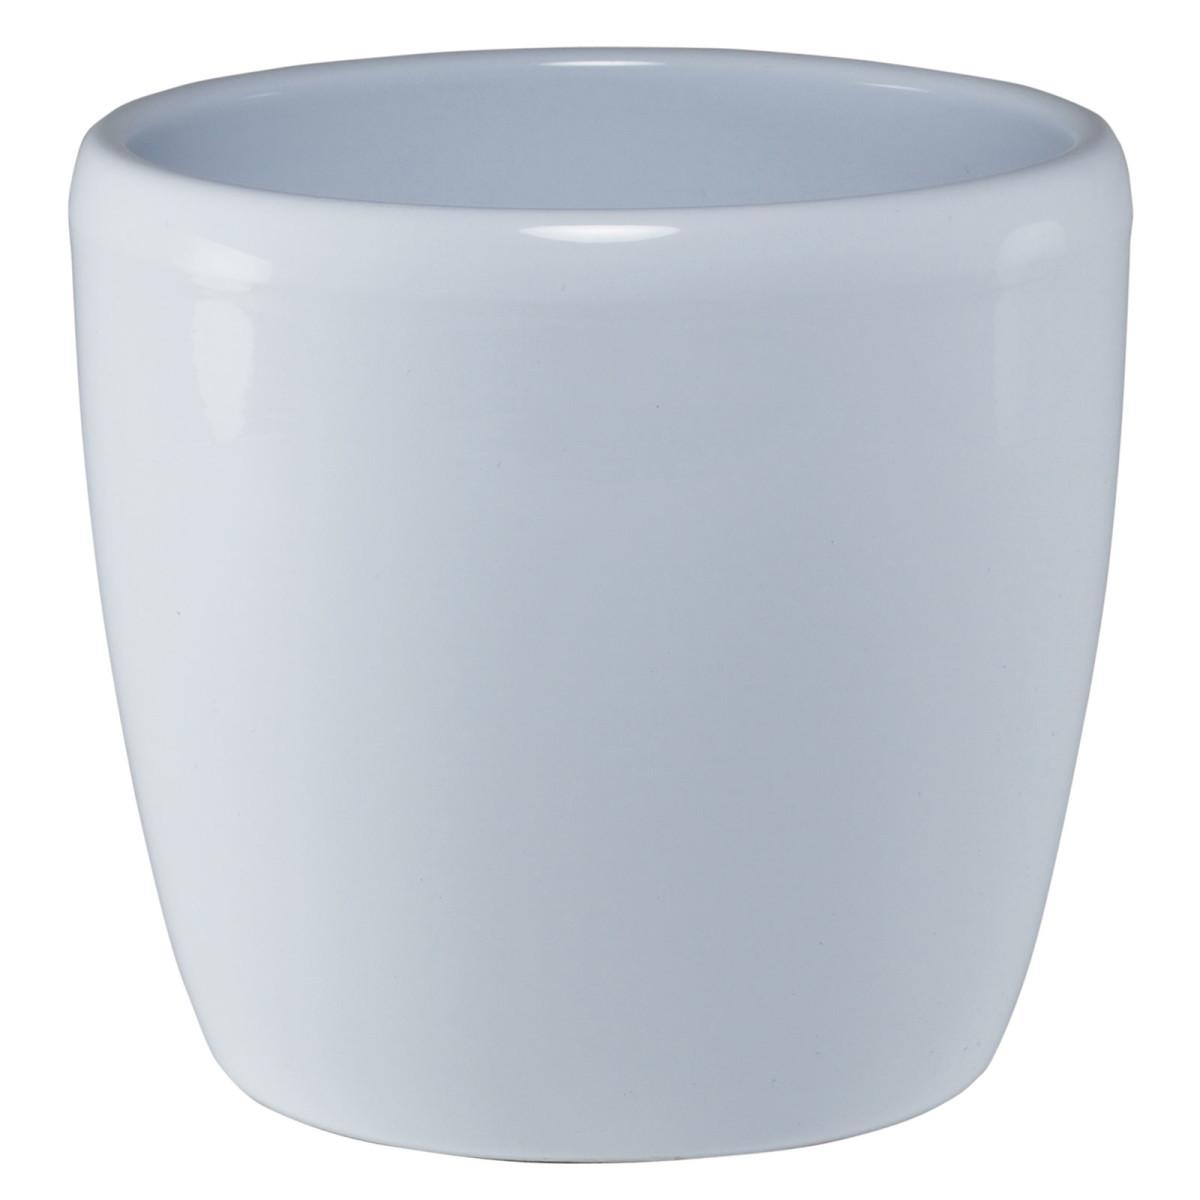 bertopf aus keramik f r hydropflanzen ins system. Black Bedroom Furniture Sets. Home Design Ideas